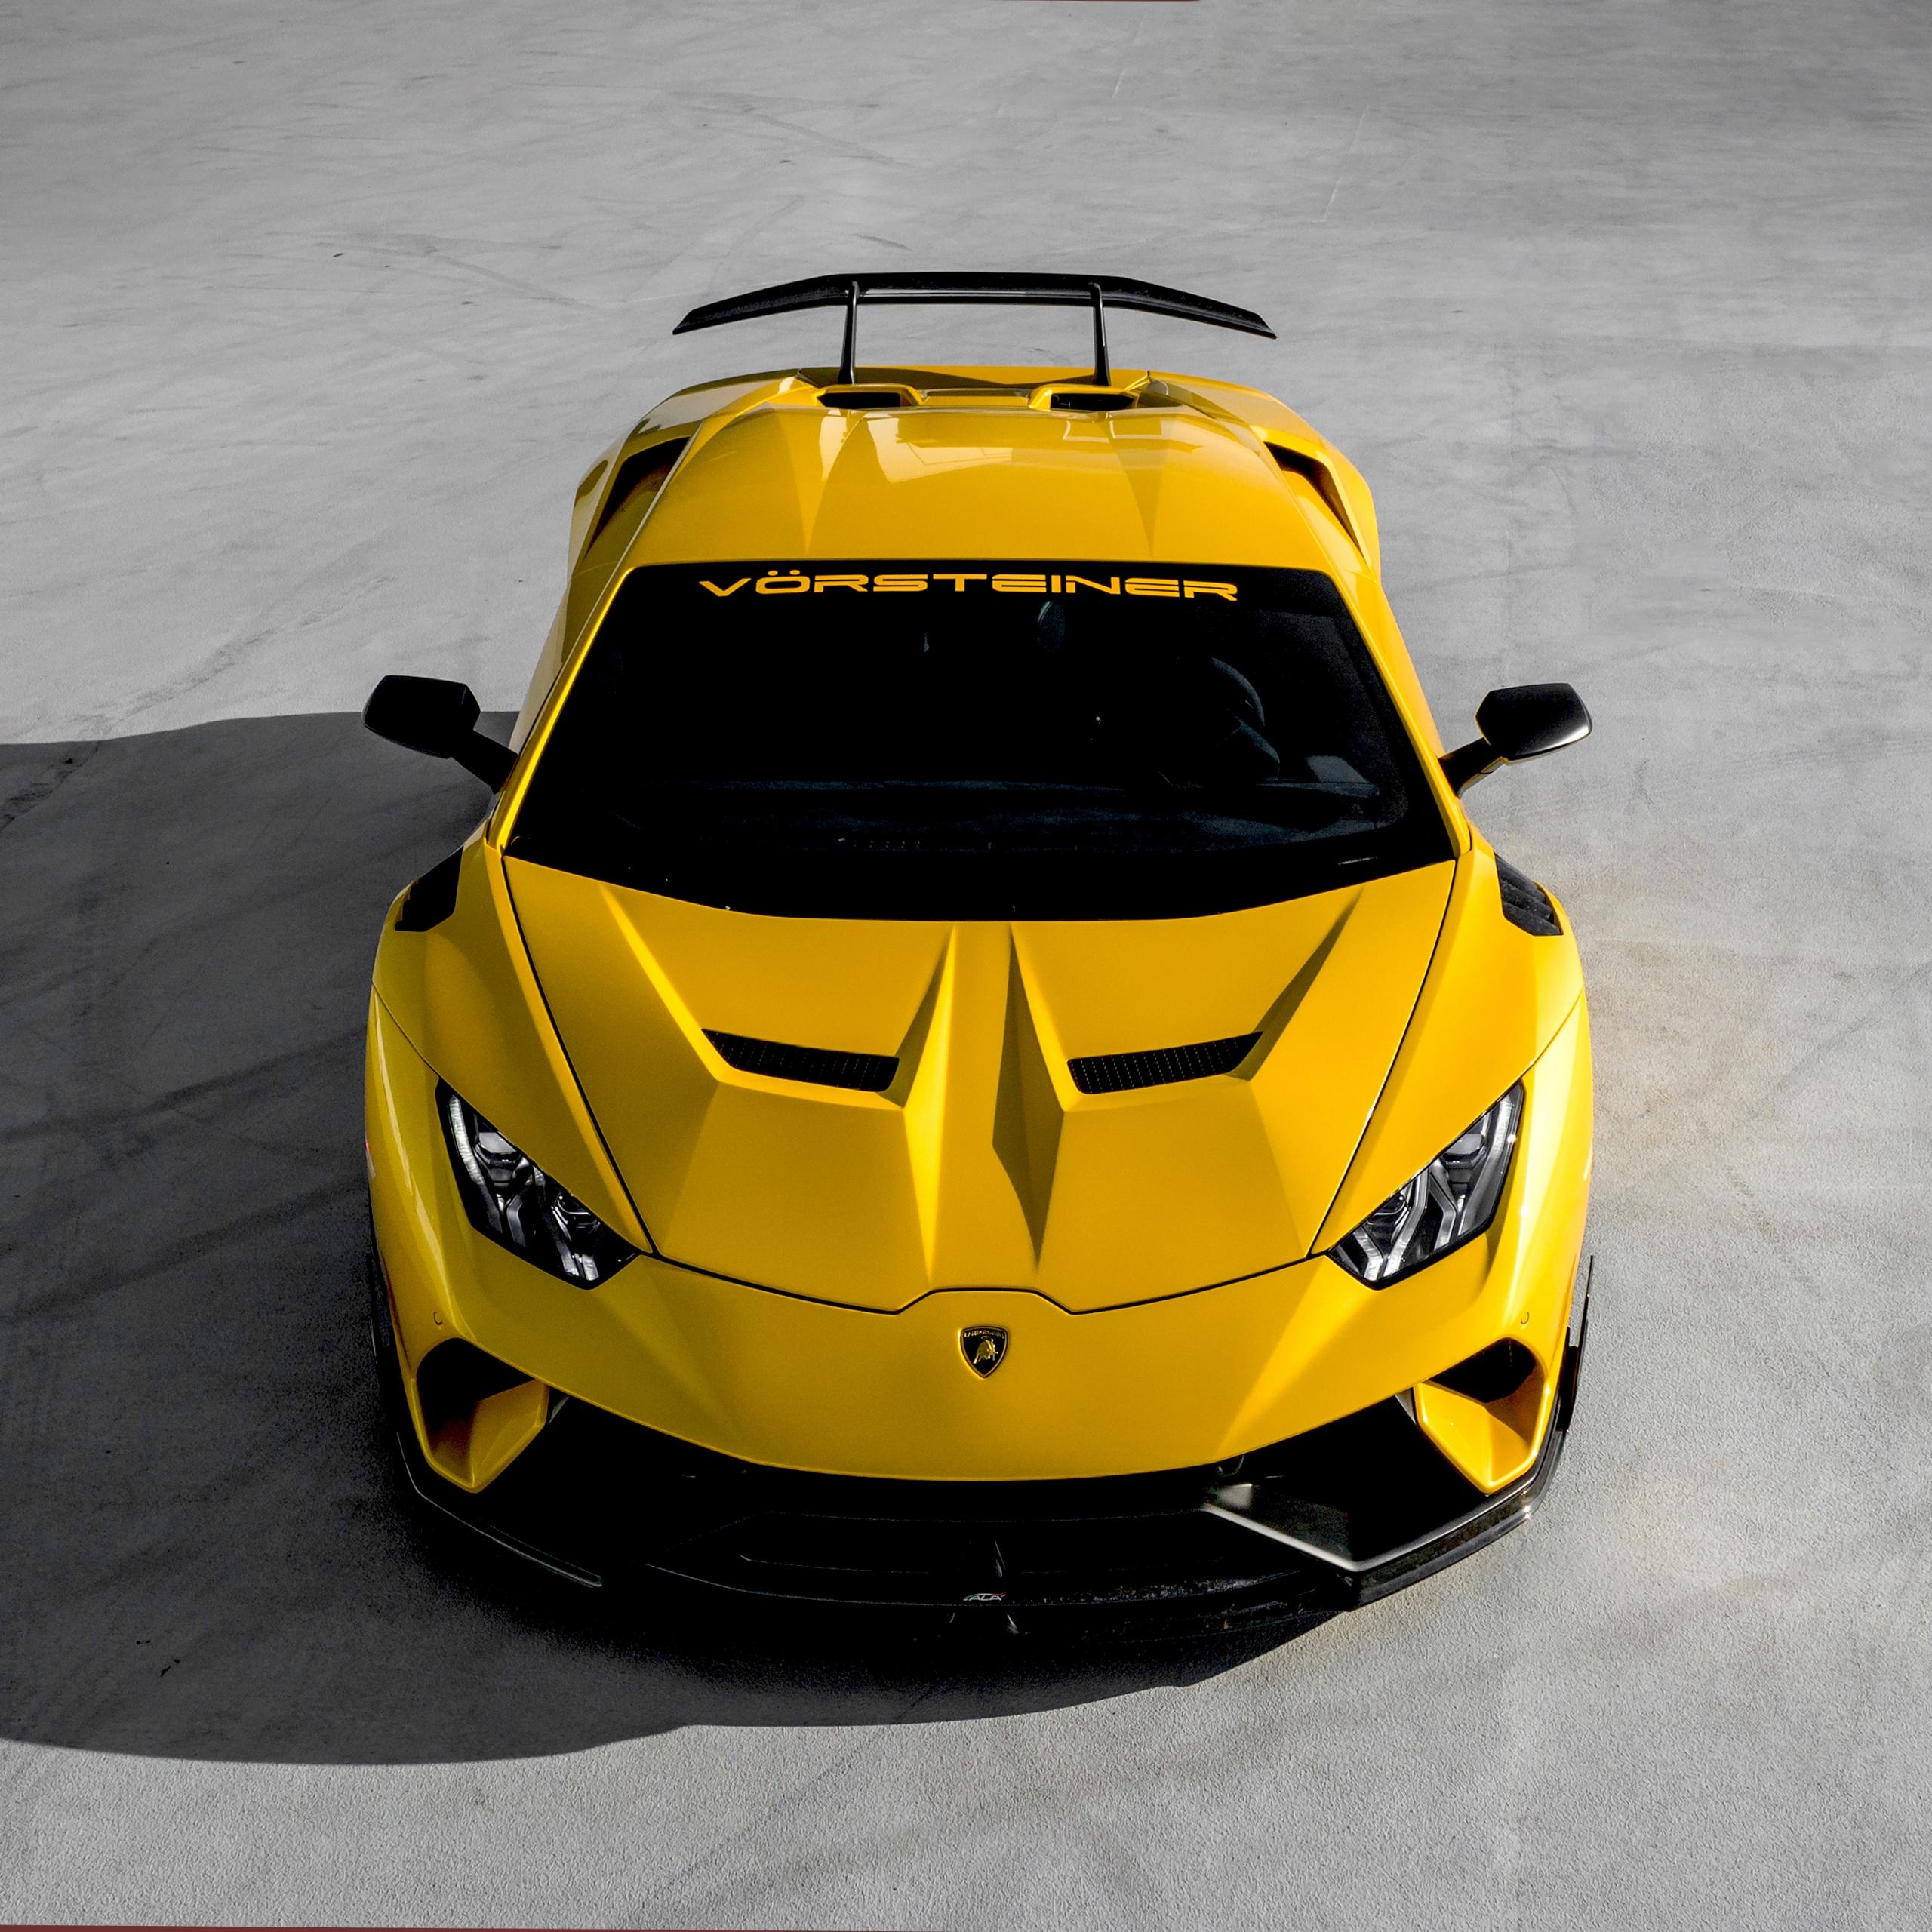 Ferrari F8 Tributo Spyder: Lamborghini Huracan 4K Wallpaper, Vorsteiner, Cars, #173